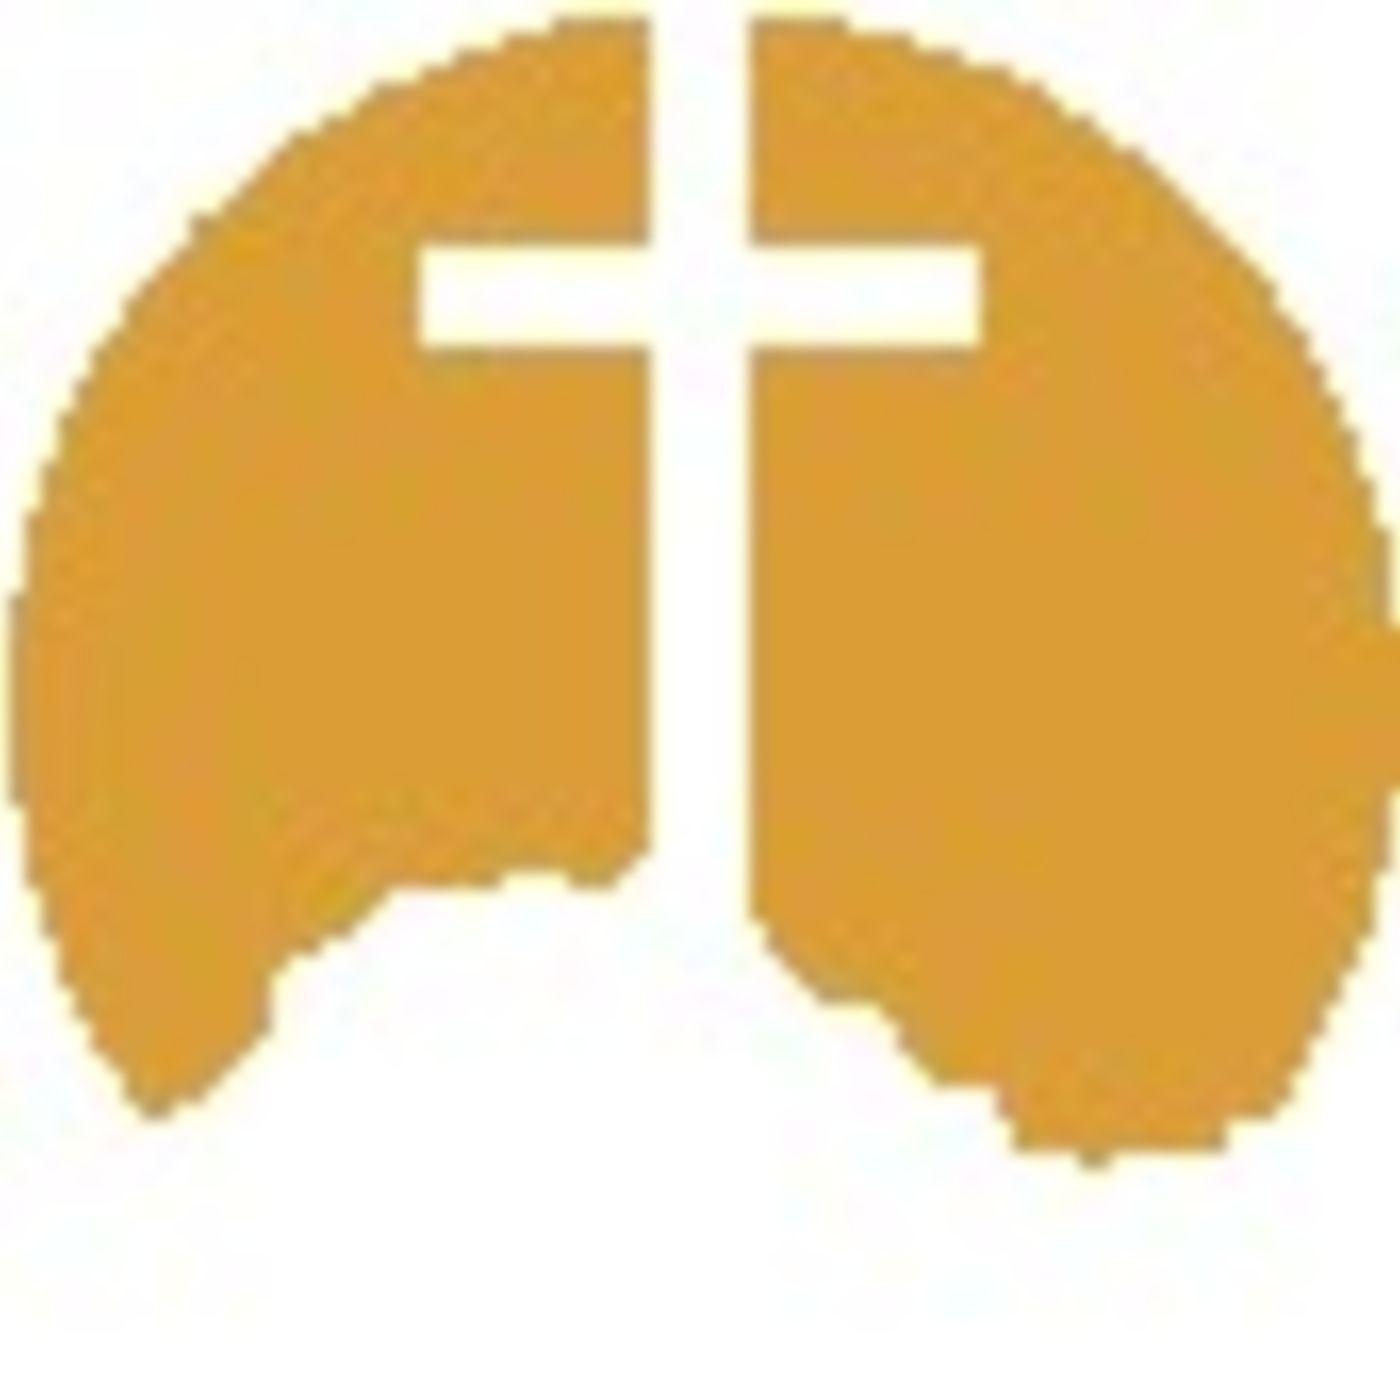 KBC School of Theology - The Trinity, Part 1